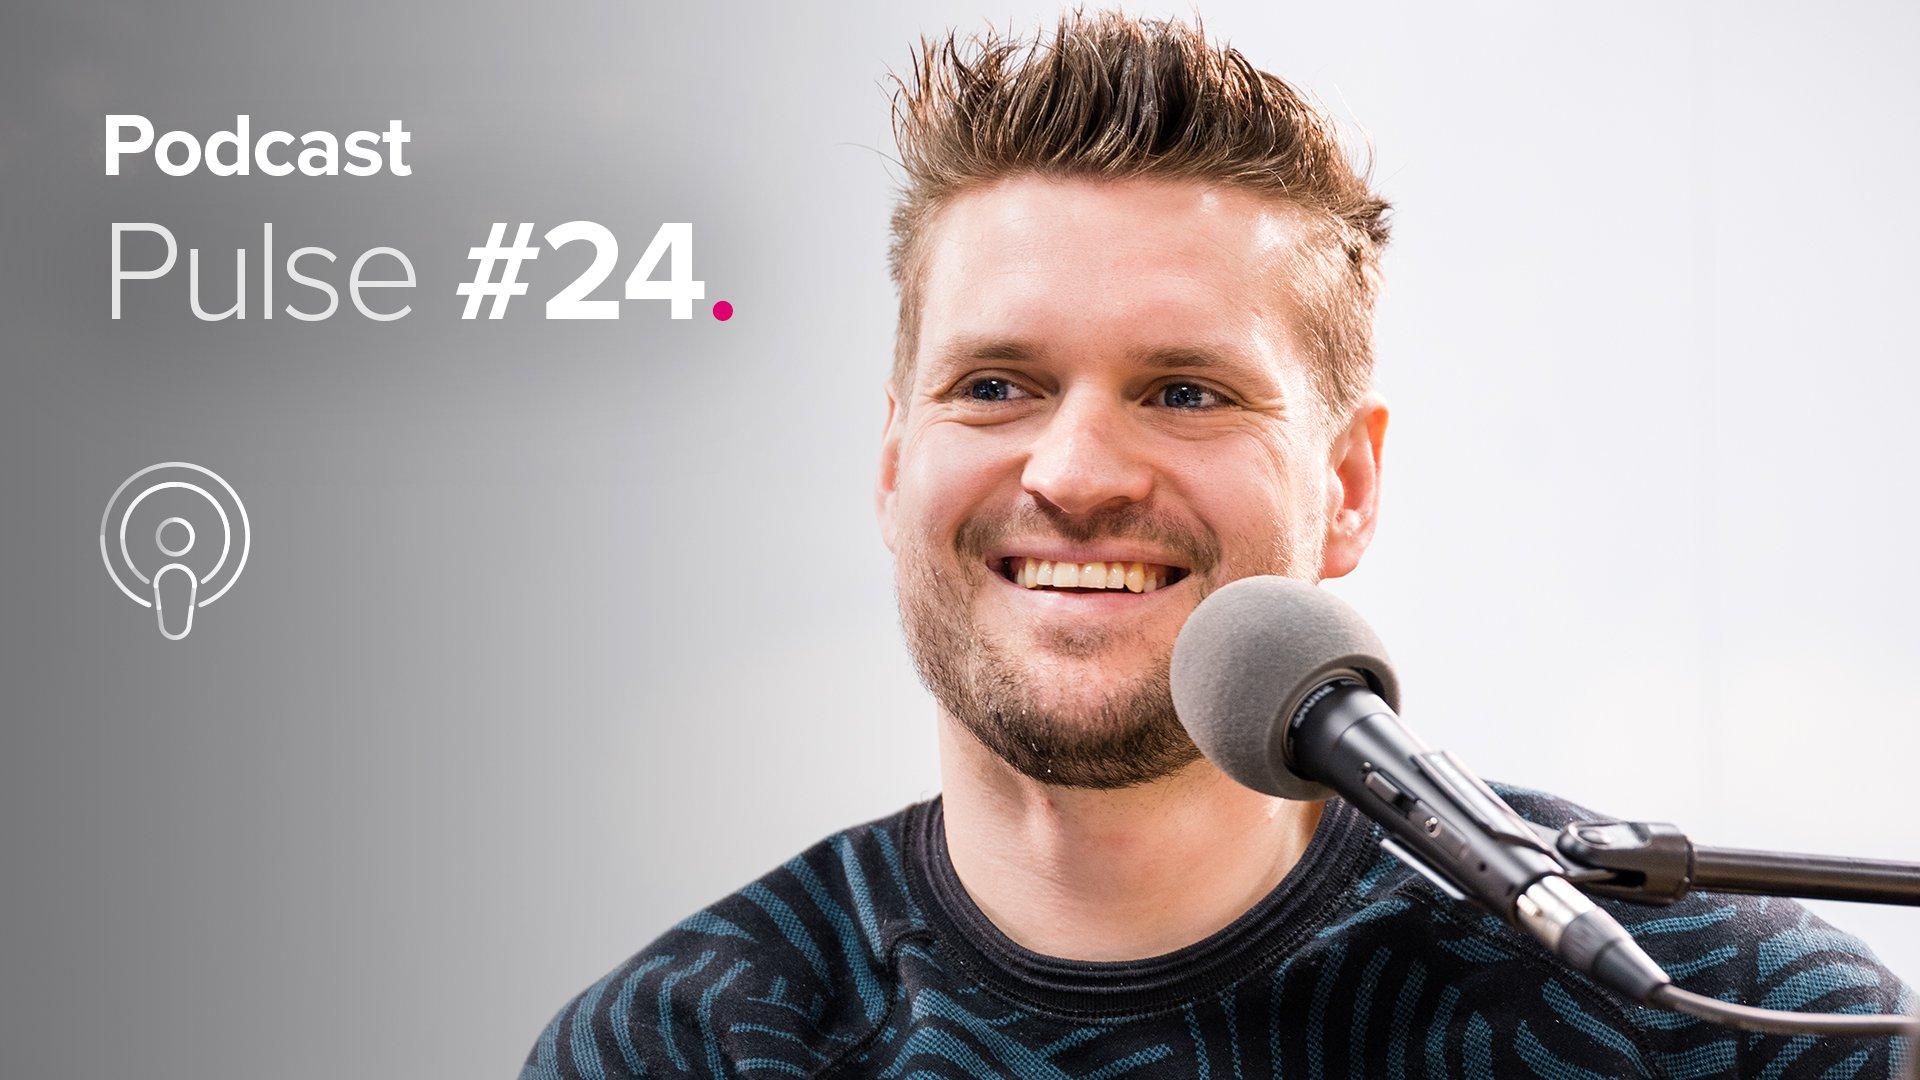 Podcast Digital Brains Pulse #24